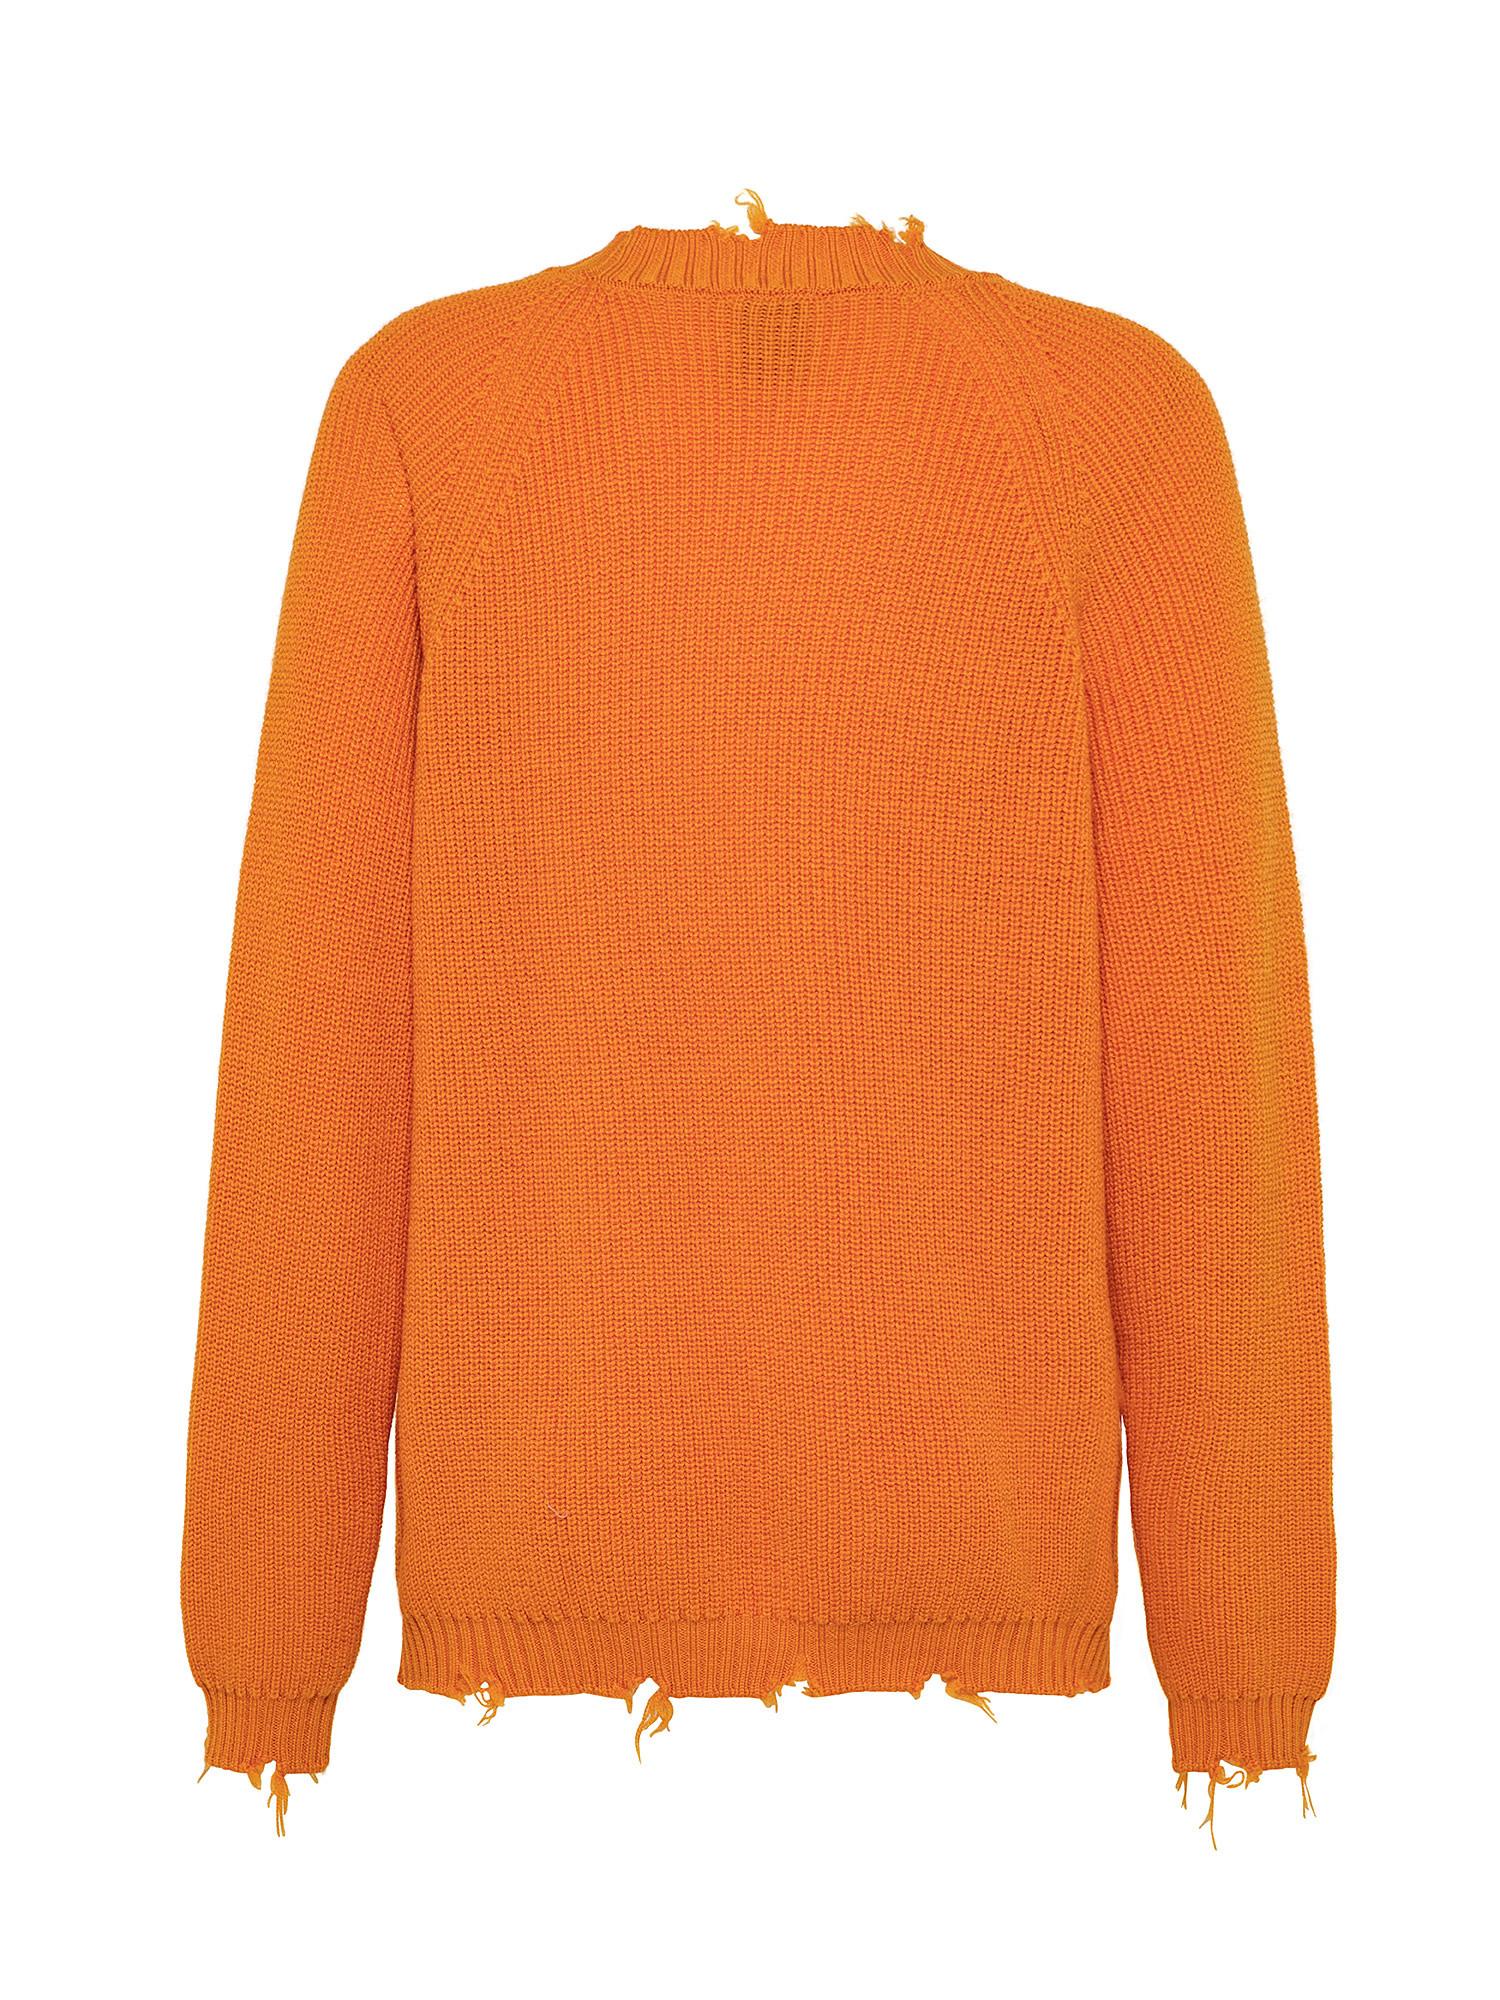 Maglione in pura lana, Arancione, large image number 1